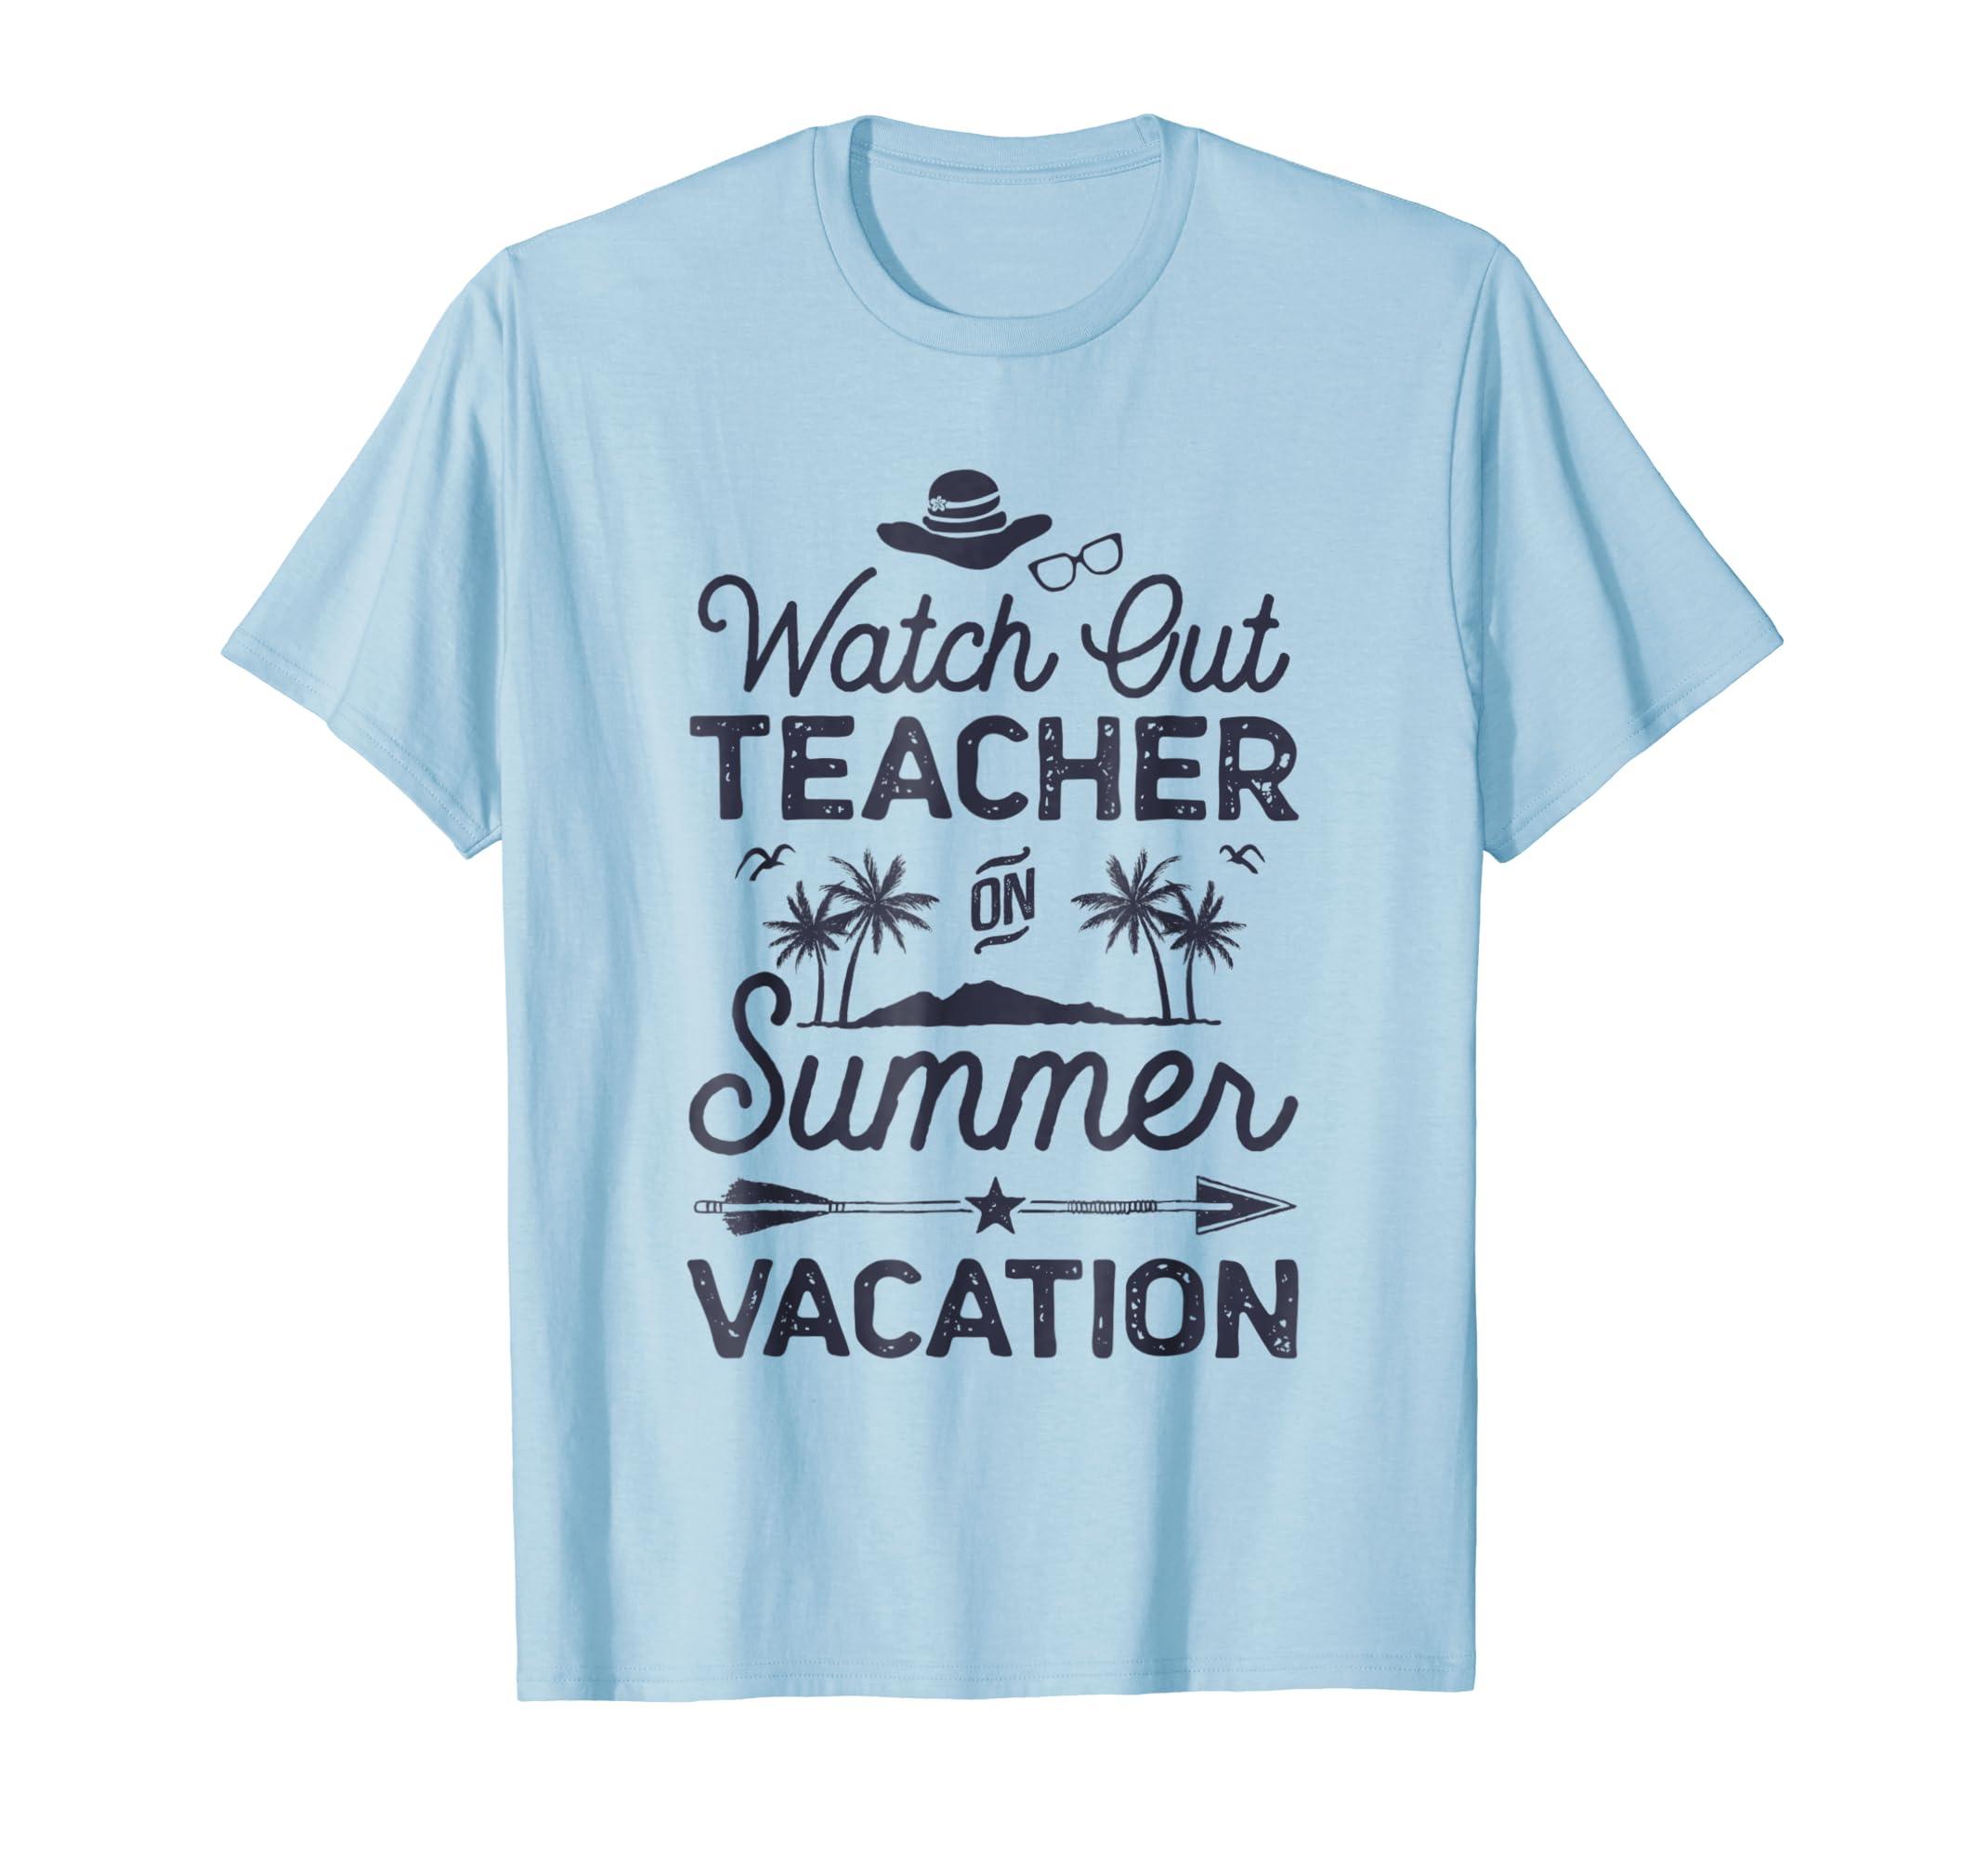 b8da147a4f29 Amazon.com  Watch Out Teacher On Summer Vacation T shirt Women Men Gifts   Clothing